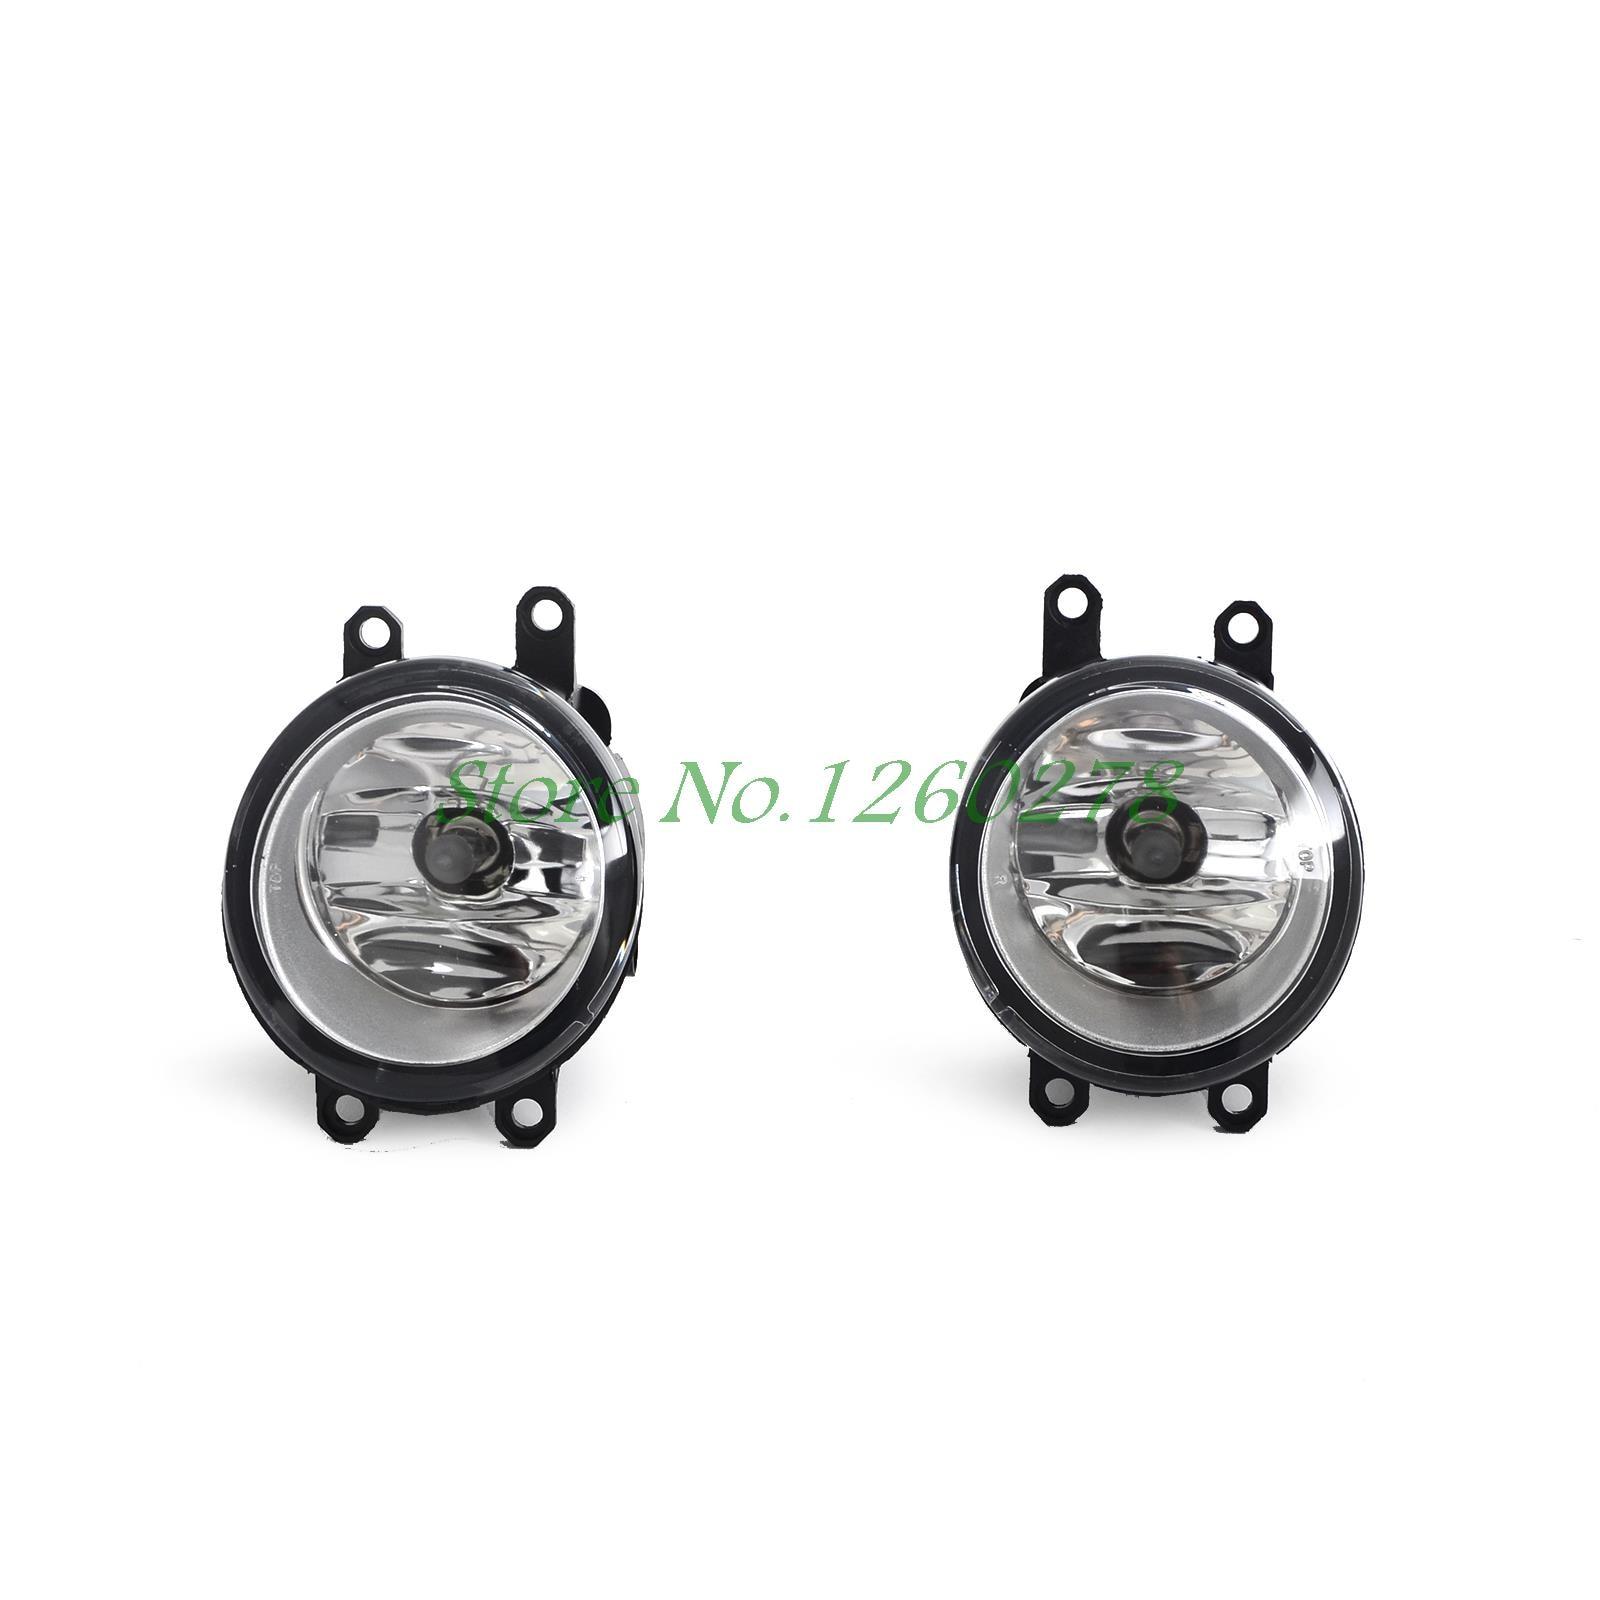 NICECNC Halogen Fog Light Lamps/H11 55W Bulbs For Lexus CT200h ES300h ES350 GS350 460 450h HS250h IS250 IS350 LX570 RX350 RX450h<br>